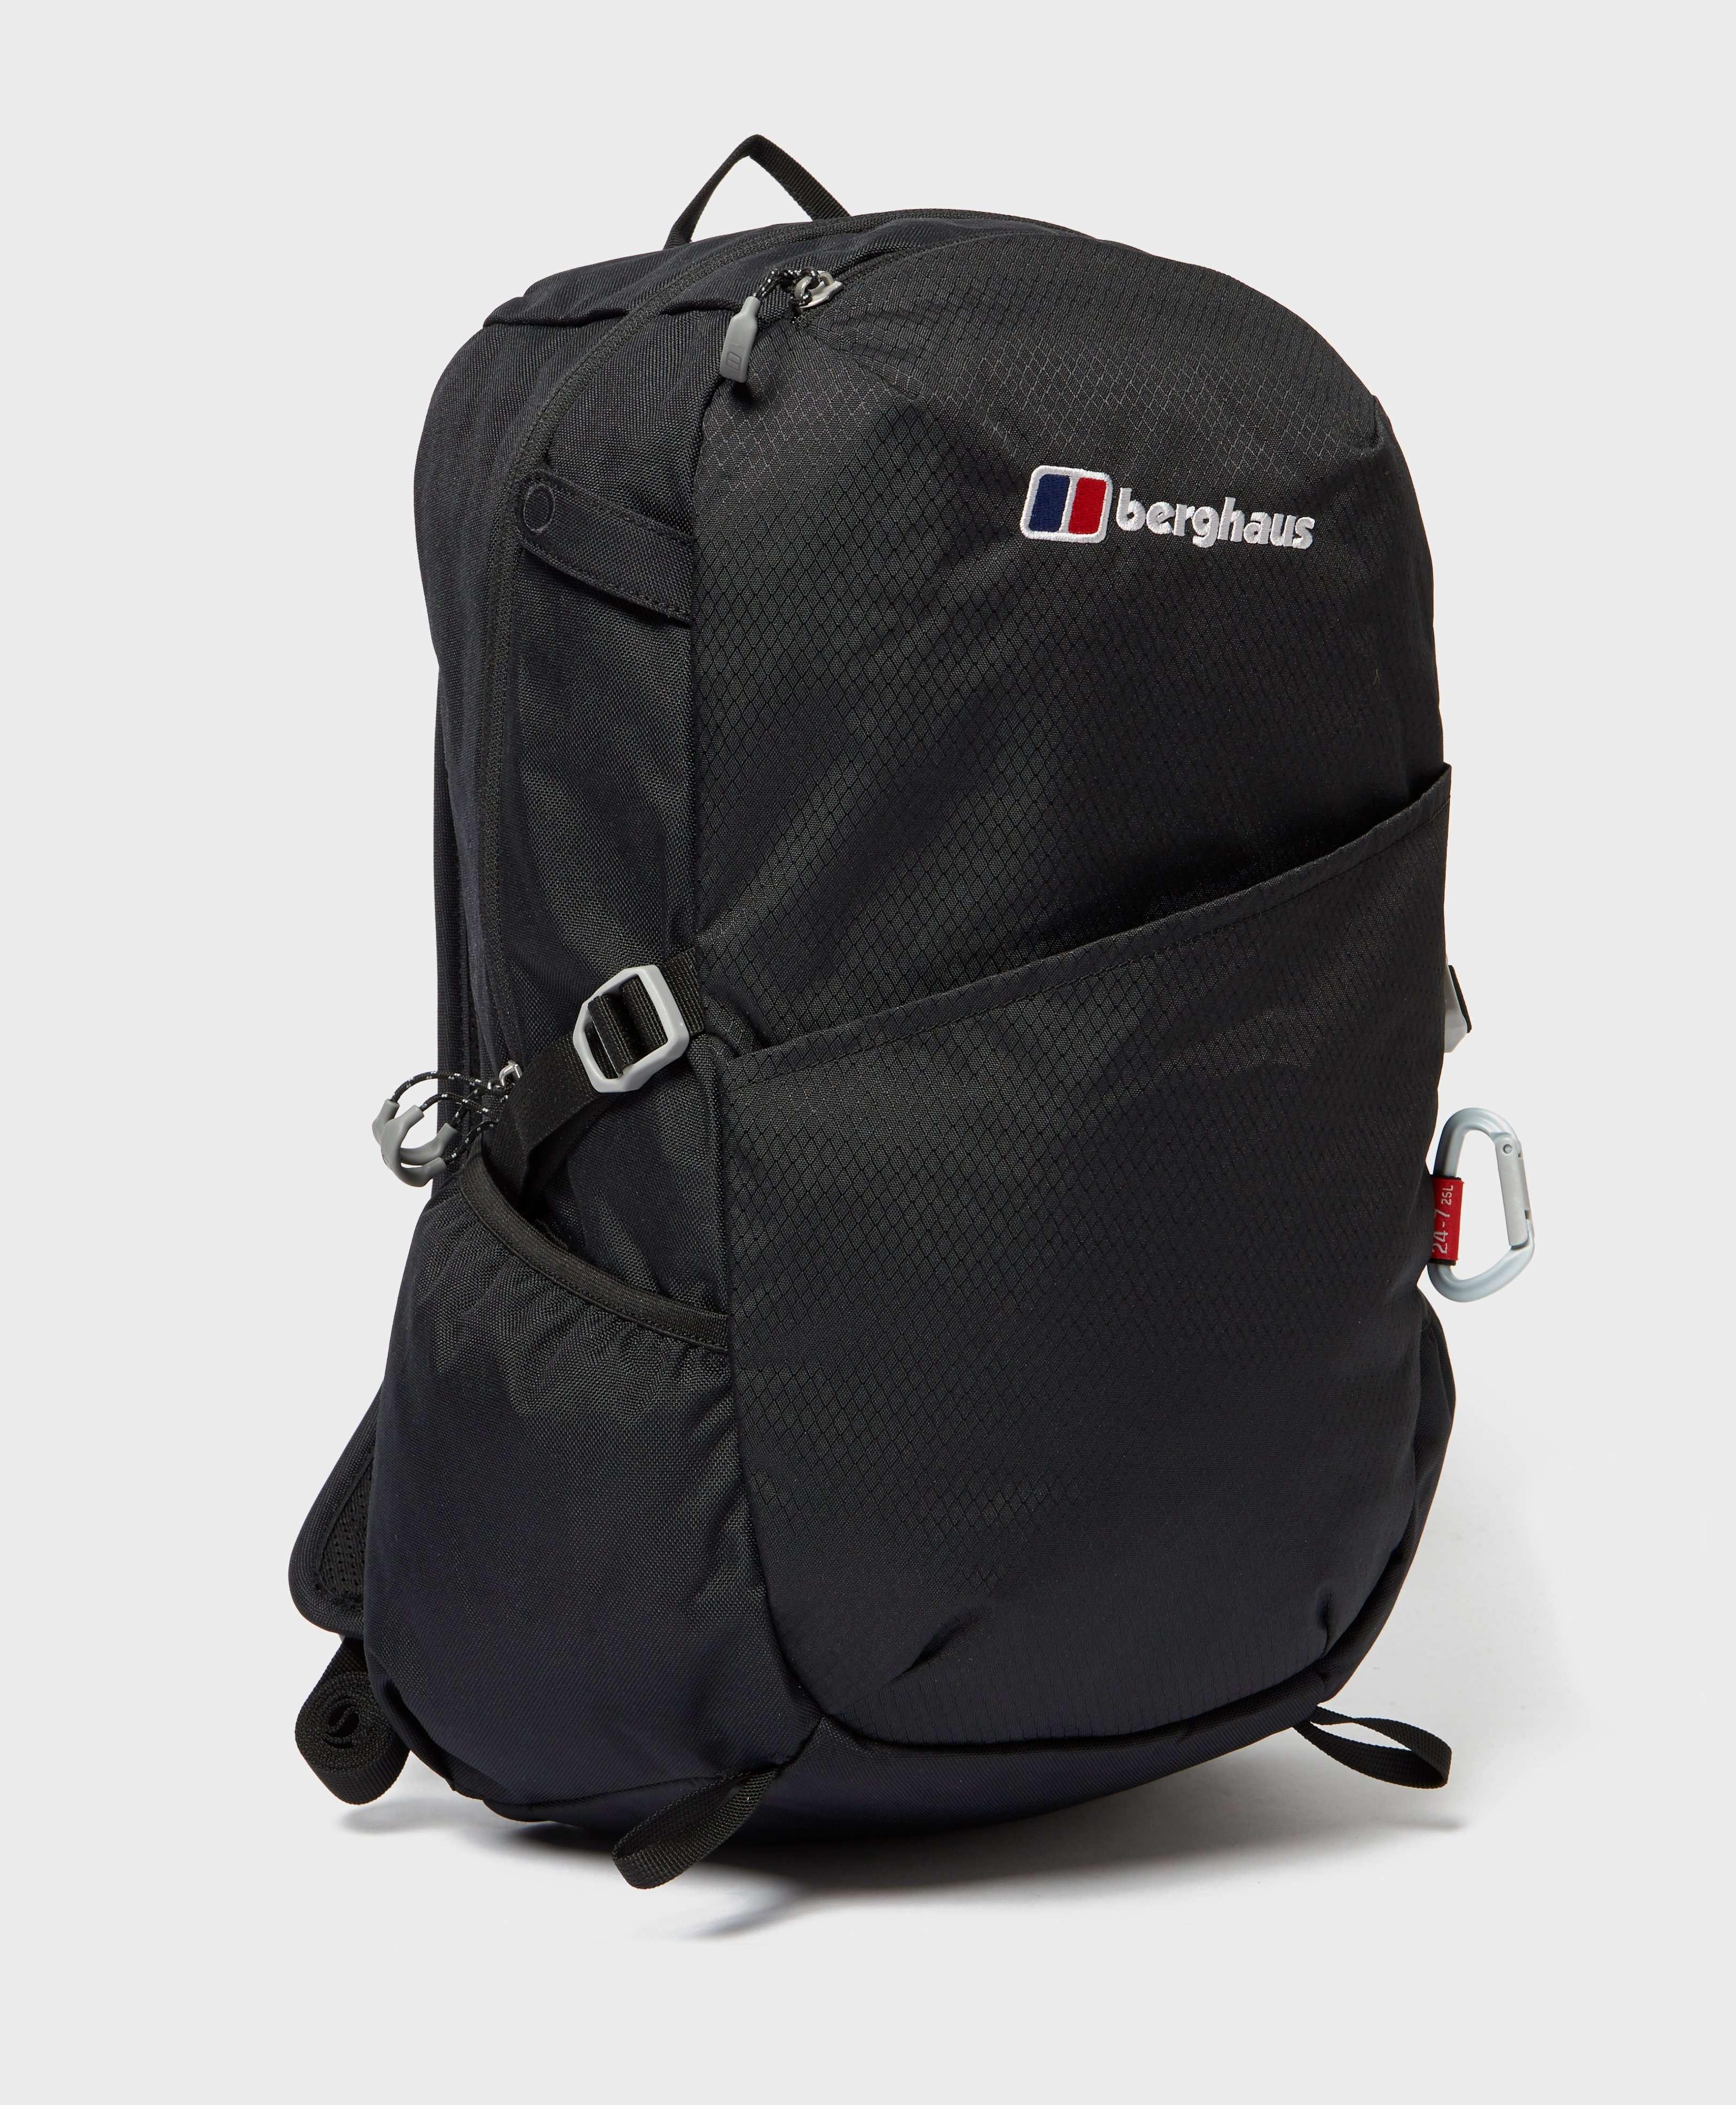 Berghaus TwentyFourSeven 25 Litre Backpack